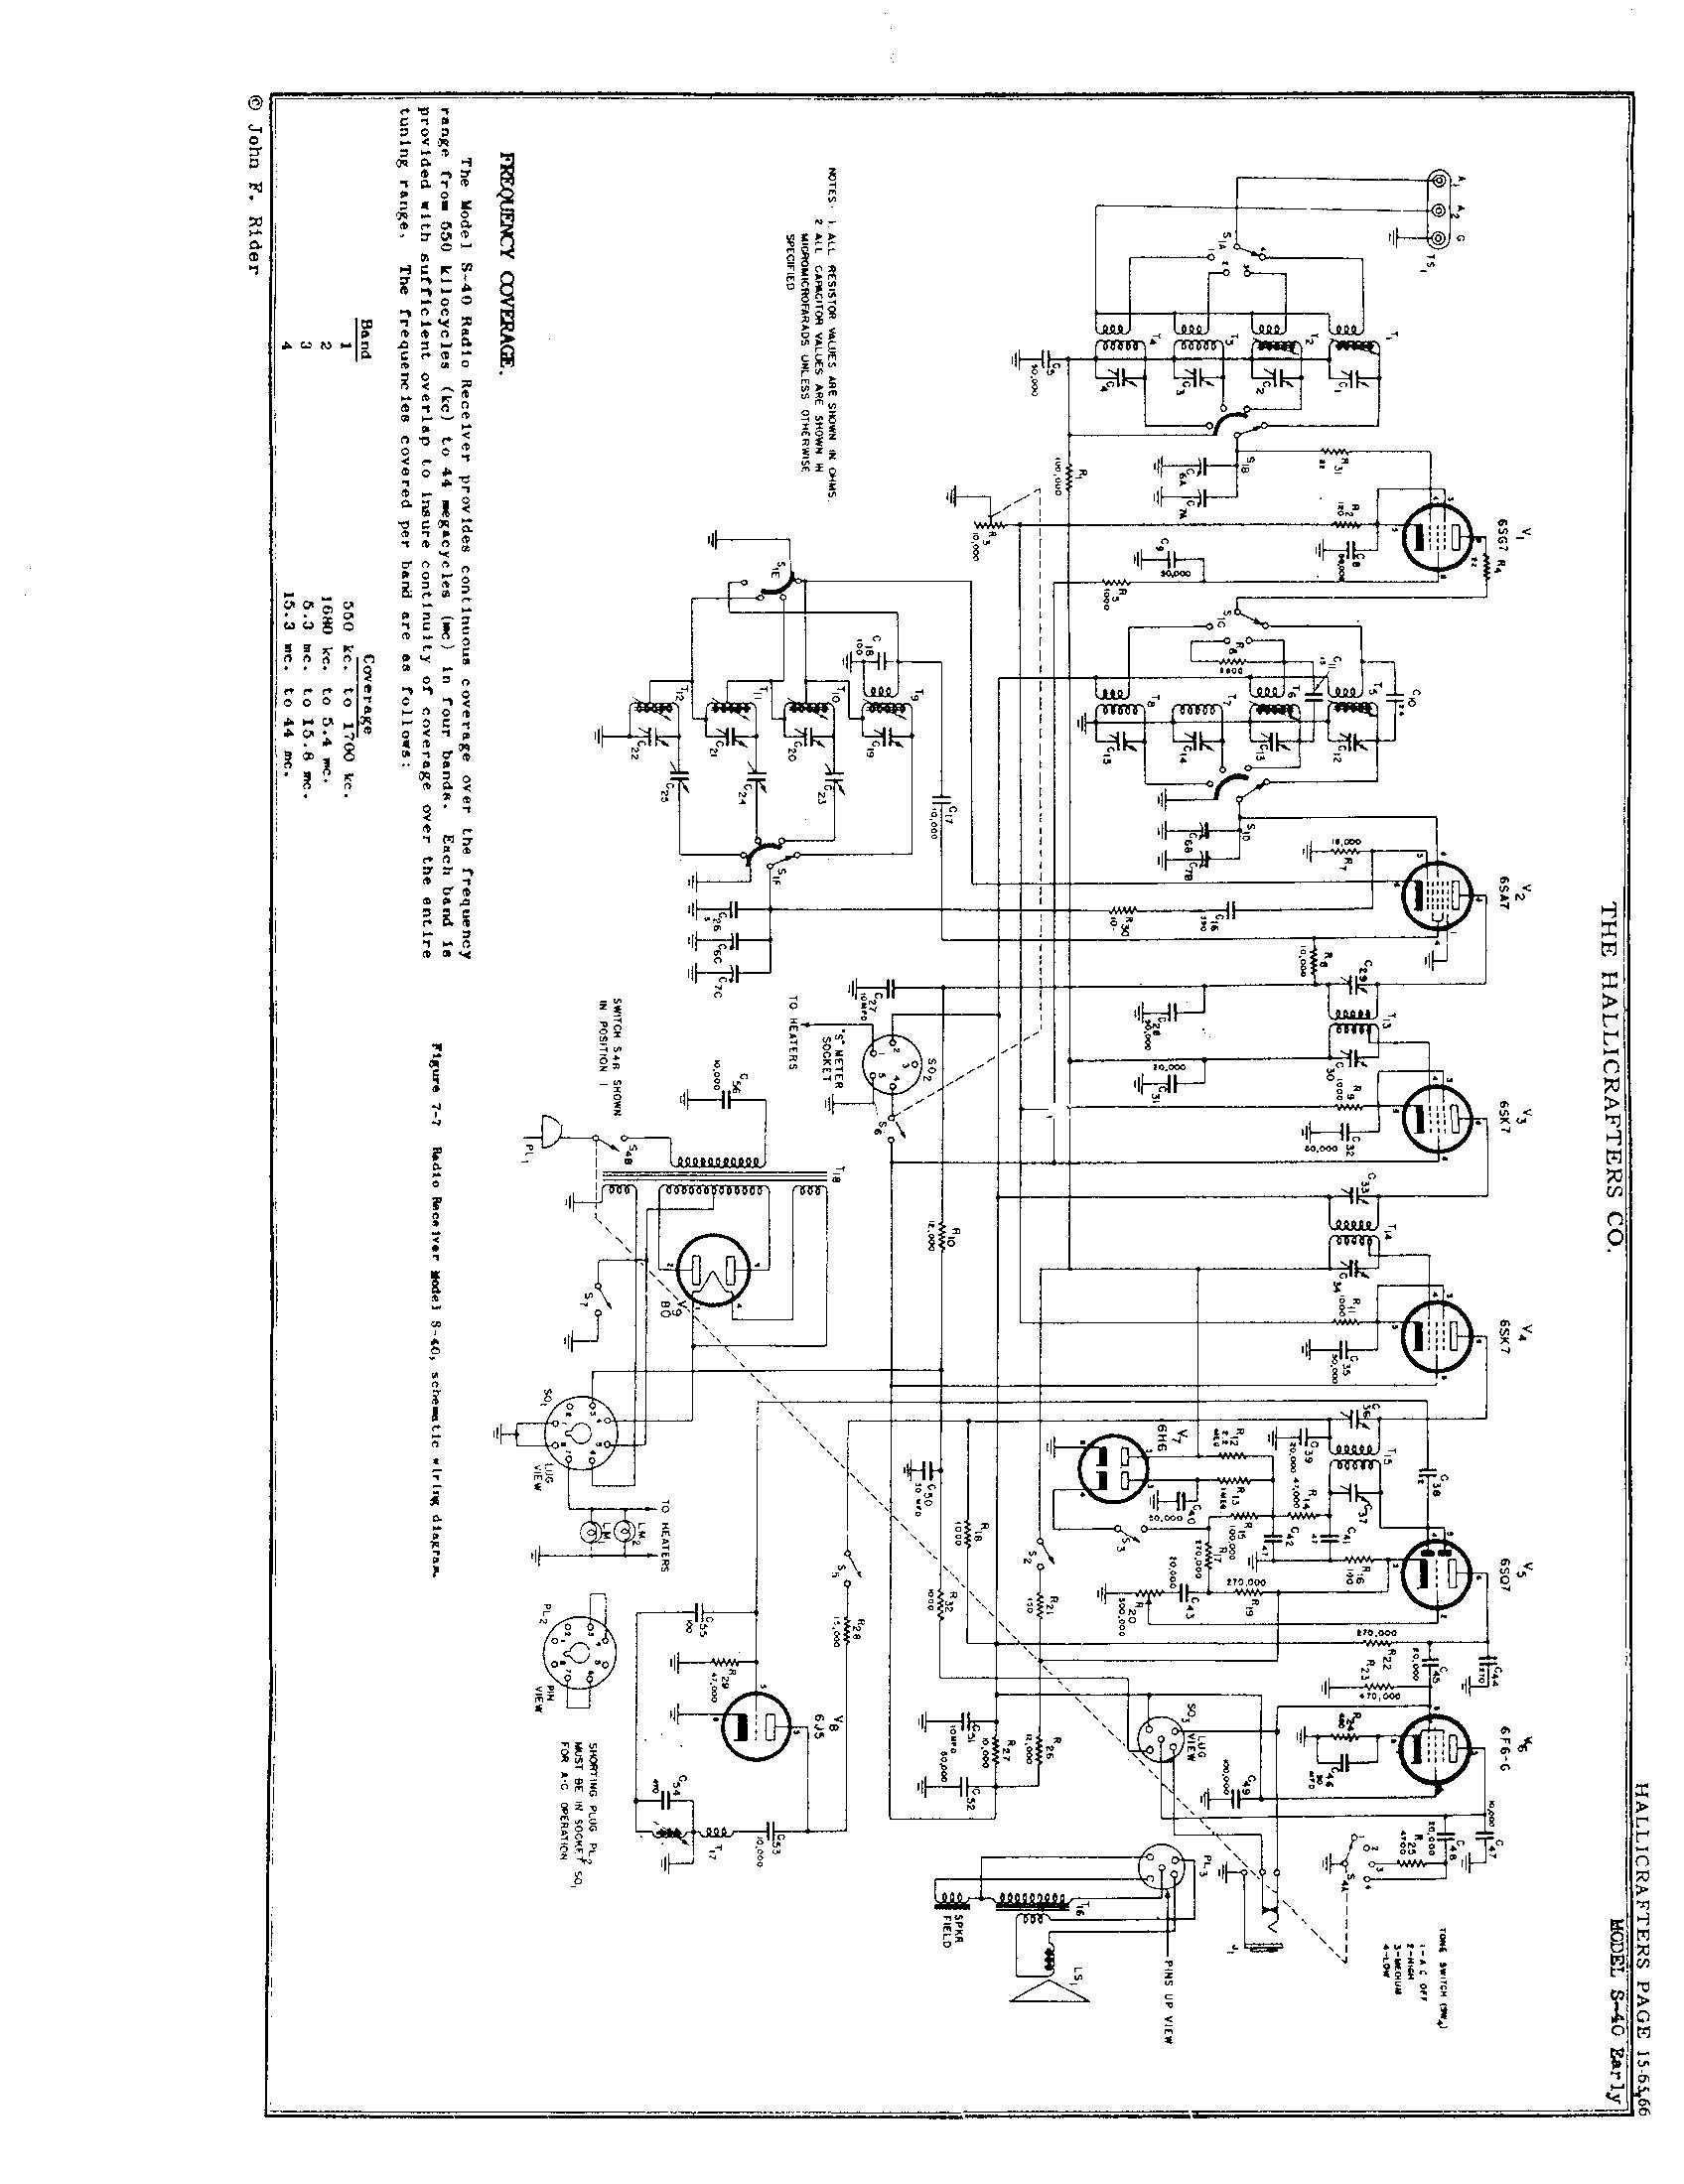 Hallicrafters, Inc. S-40 Schematic